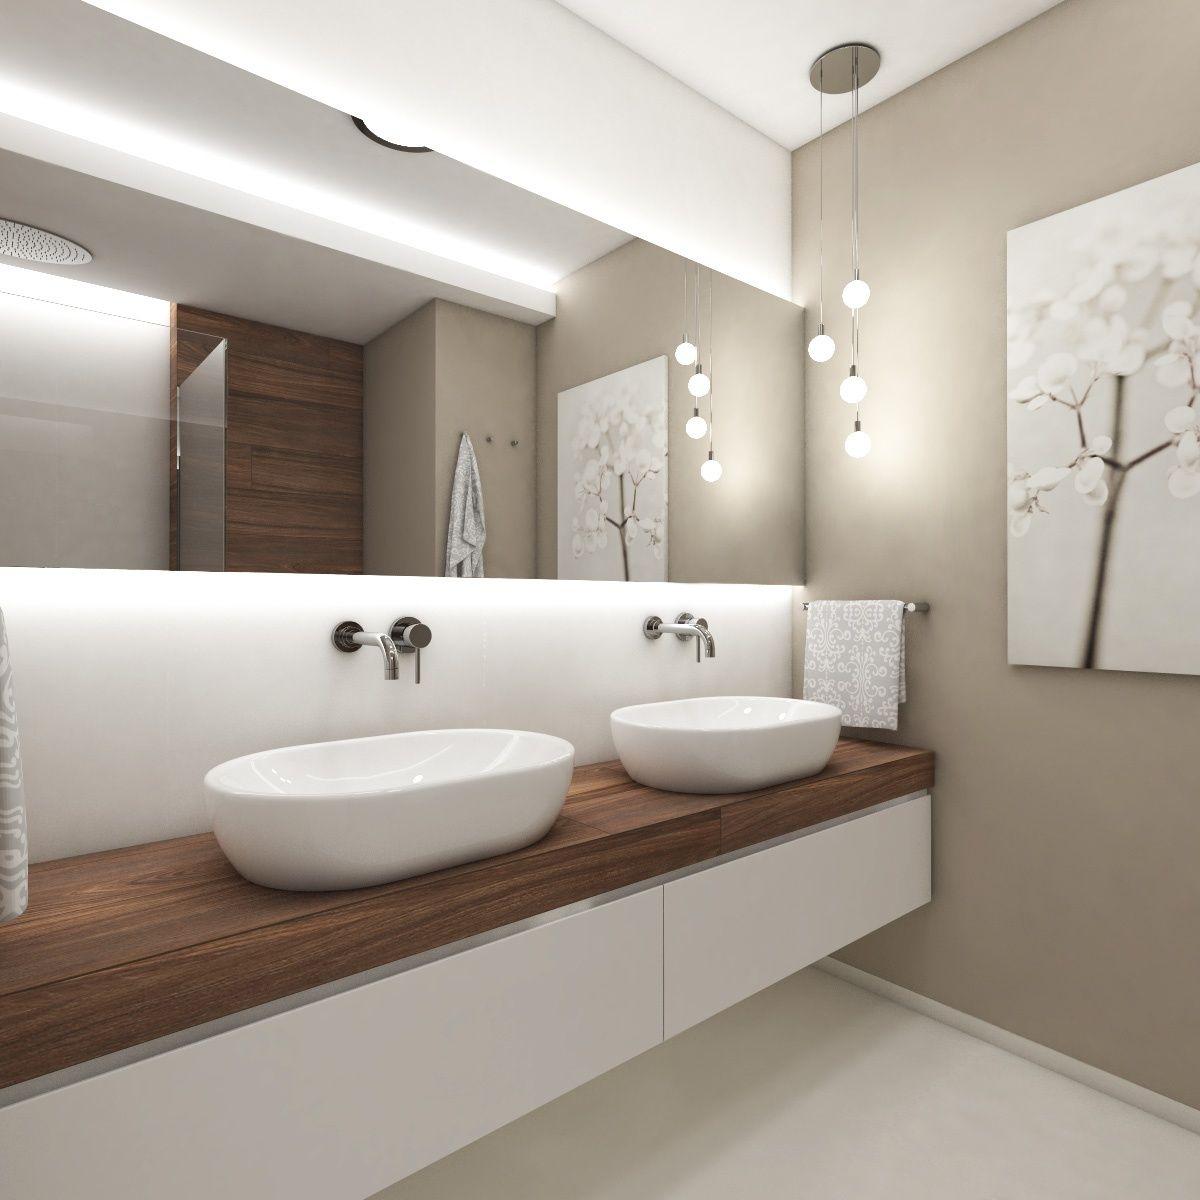 Prirodni Koupelna Milano Vizualizace Modernes Badezimmerdesign Badezimmereinrichtung Badezimmerideen